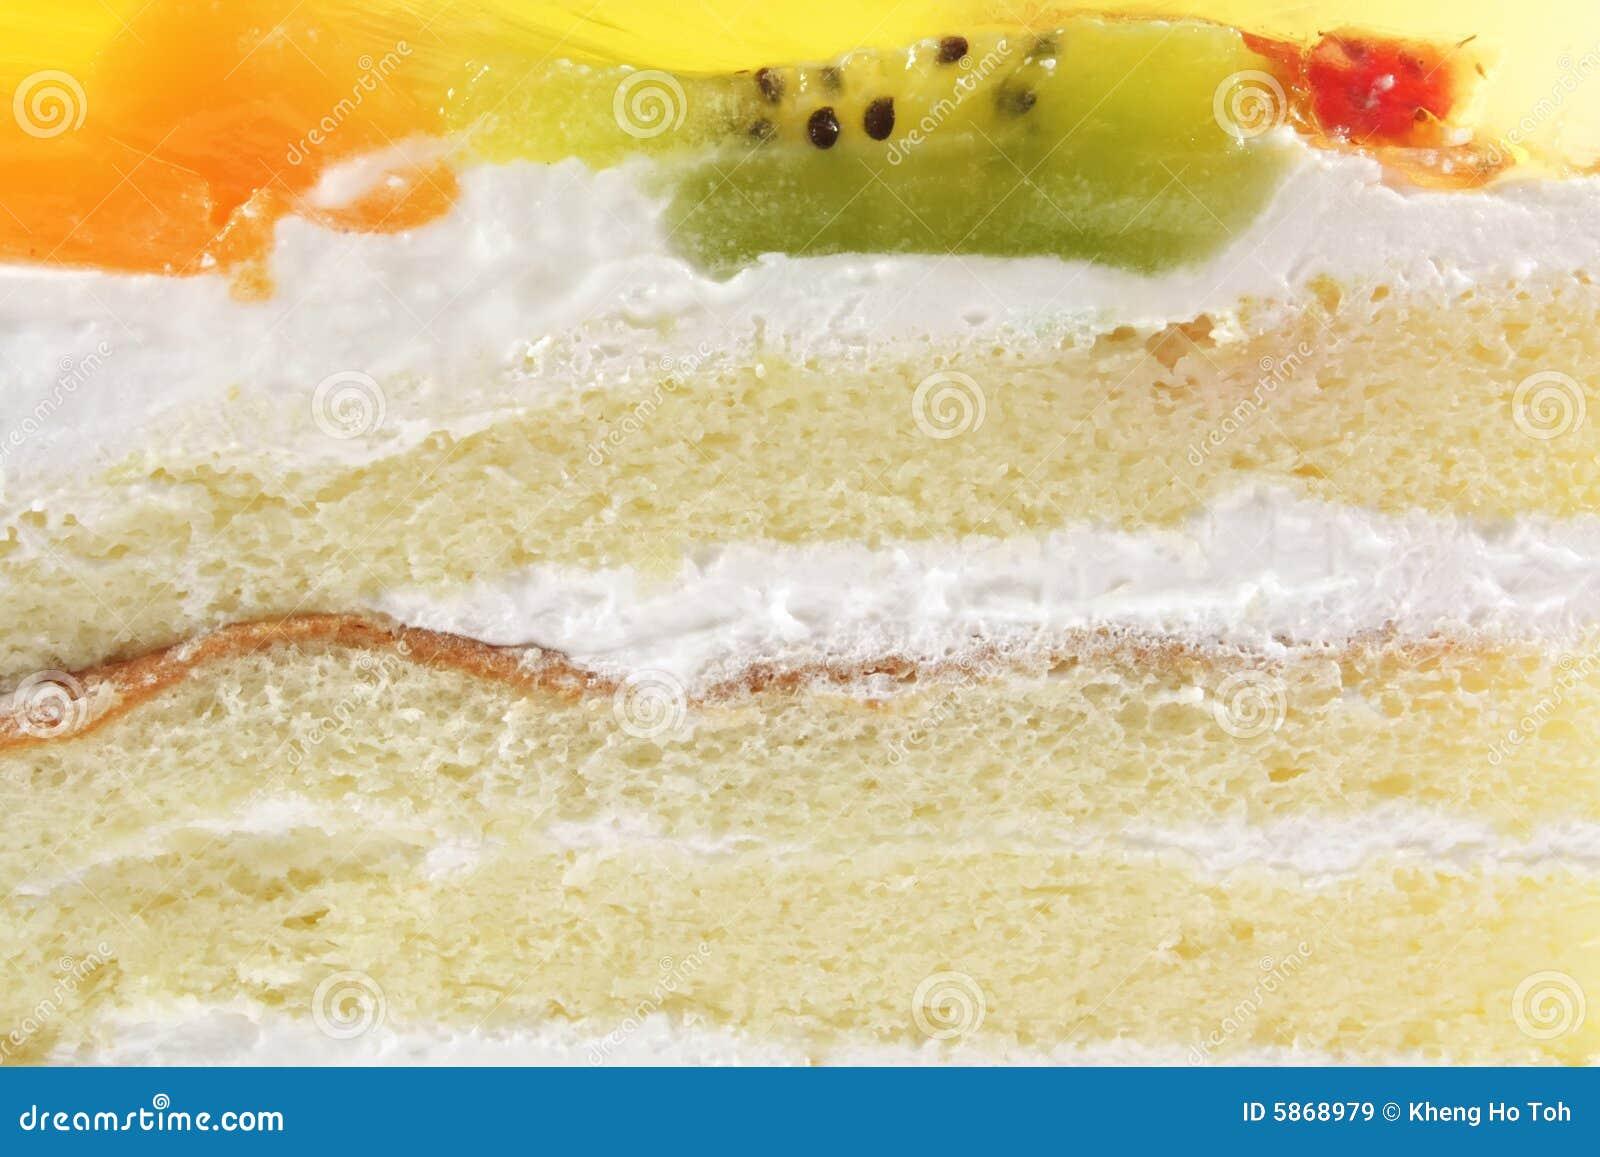 White Sponge Cream Cake With Gelatin Fruit Topping Stock Image